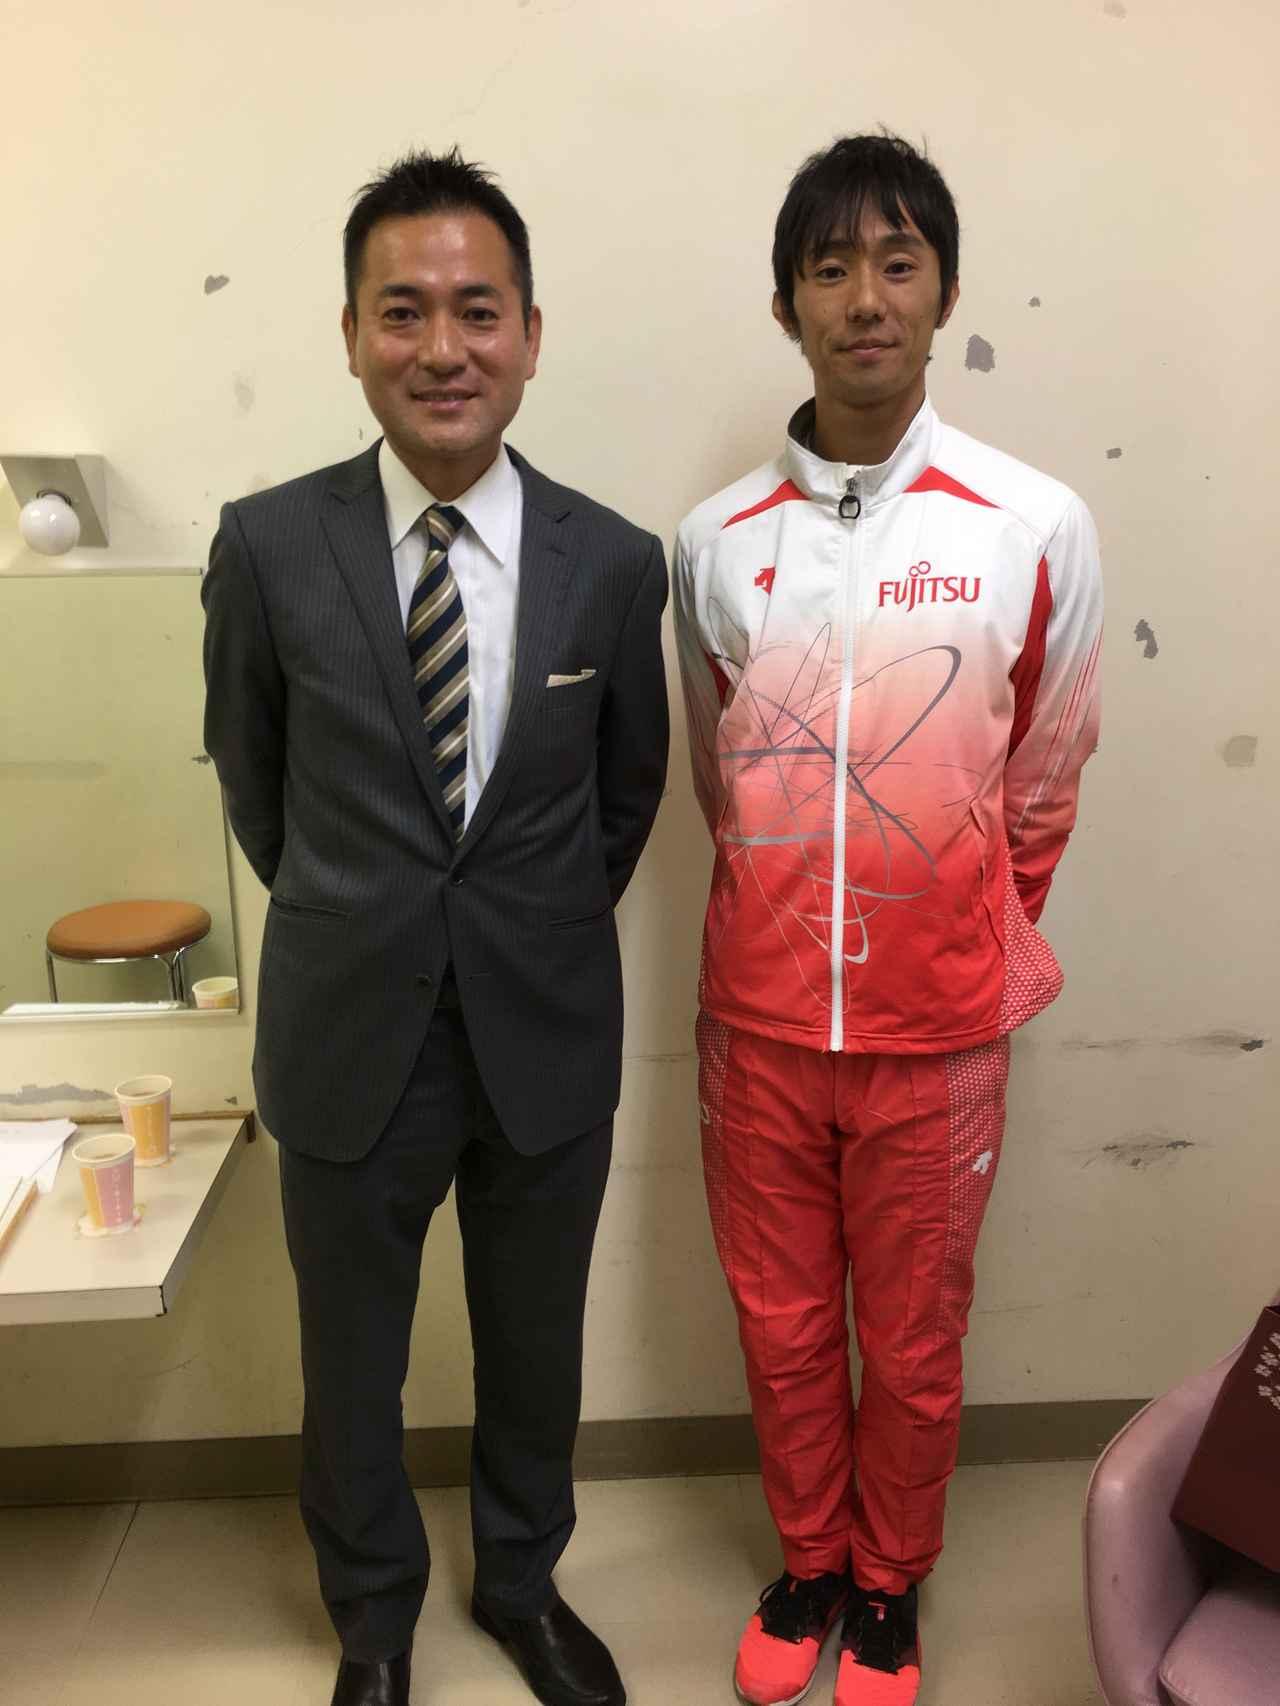 画像: 2016年静岡西高校の40周年記念式典で